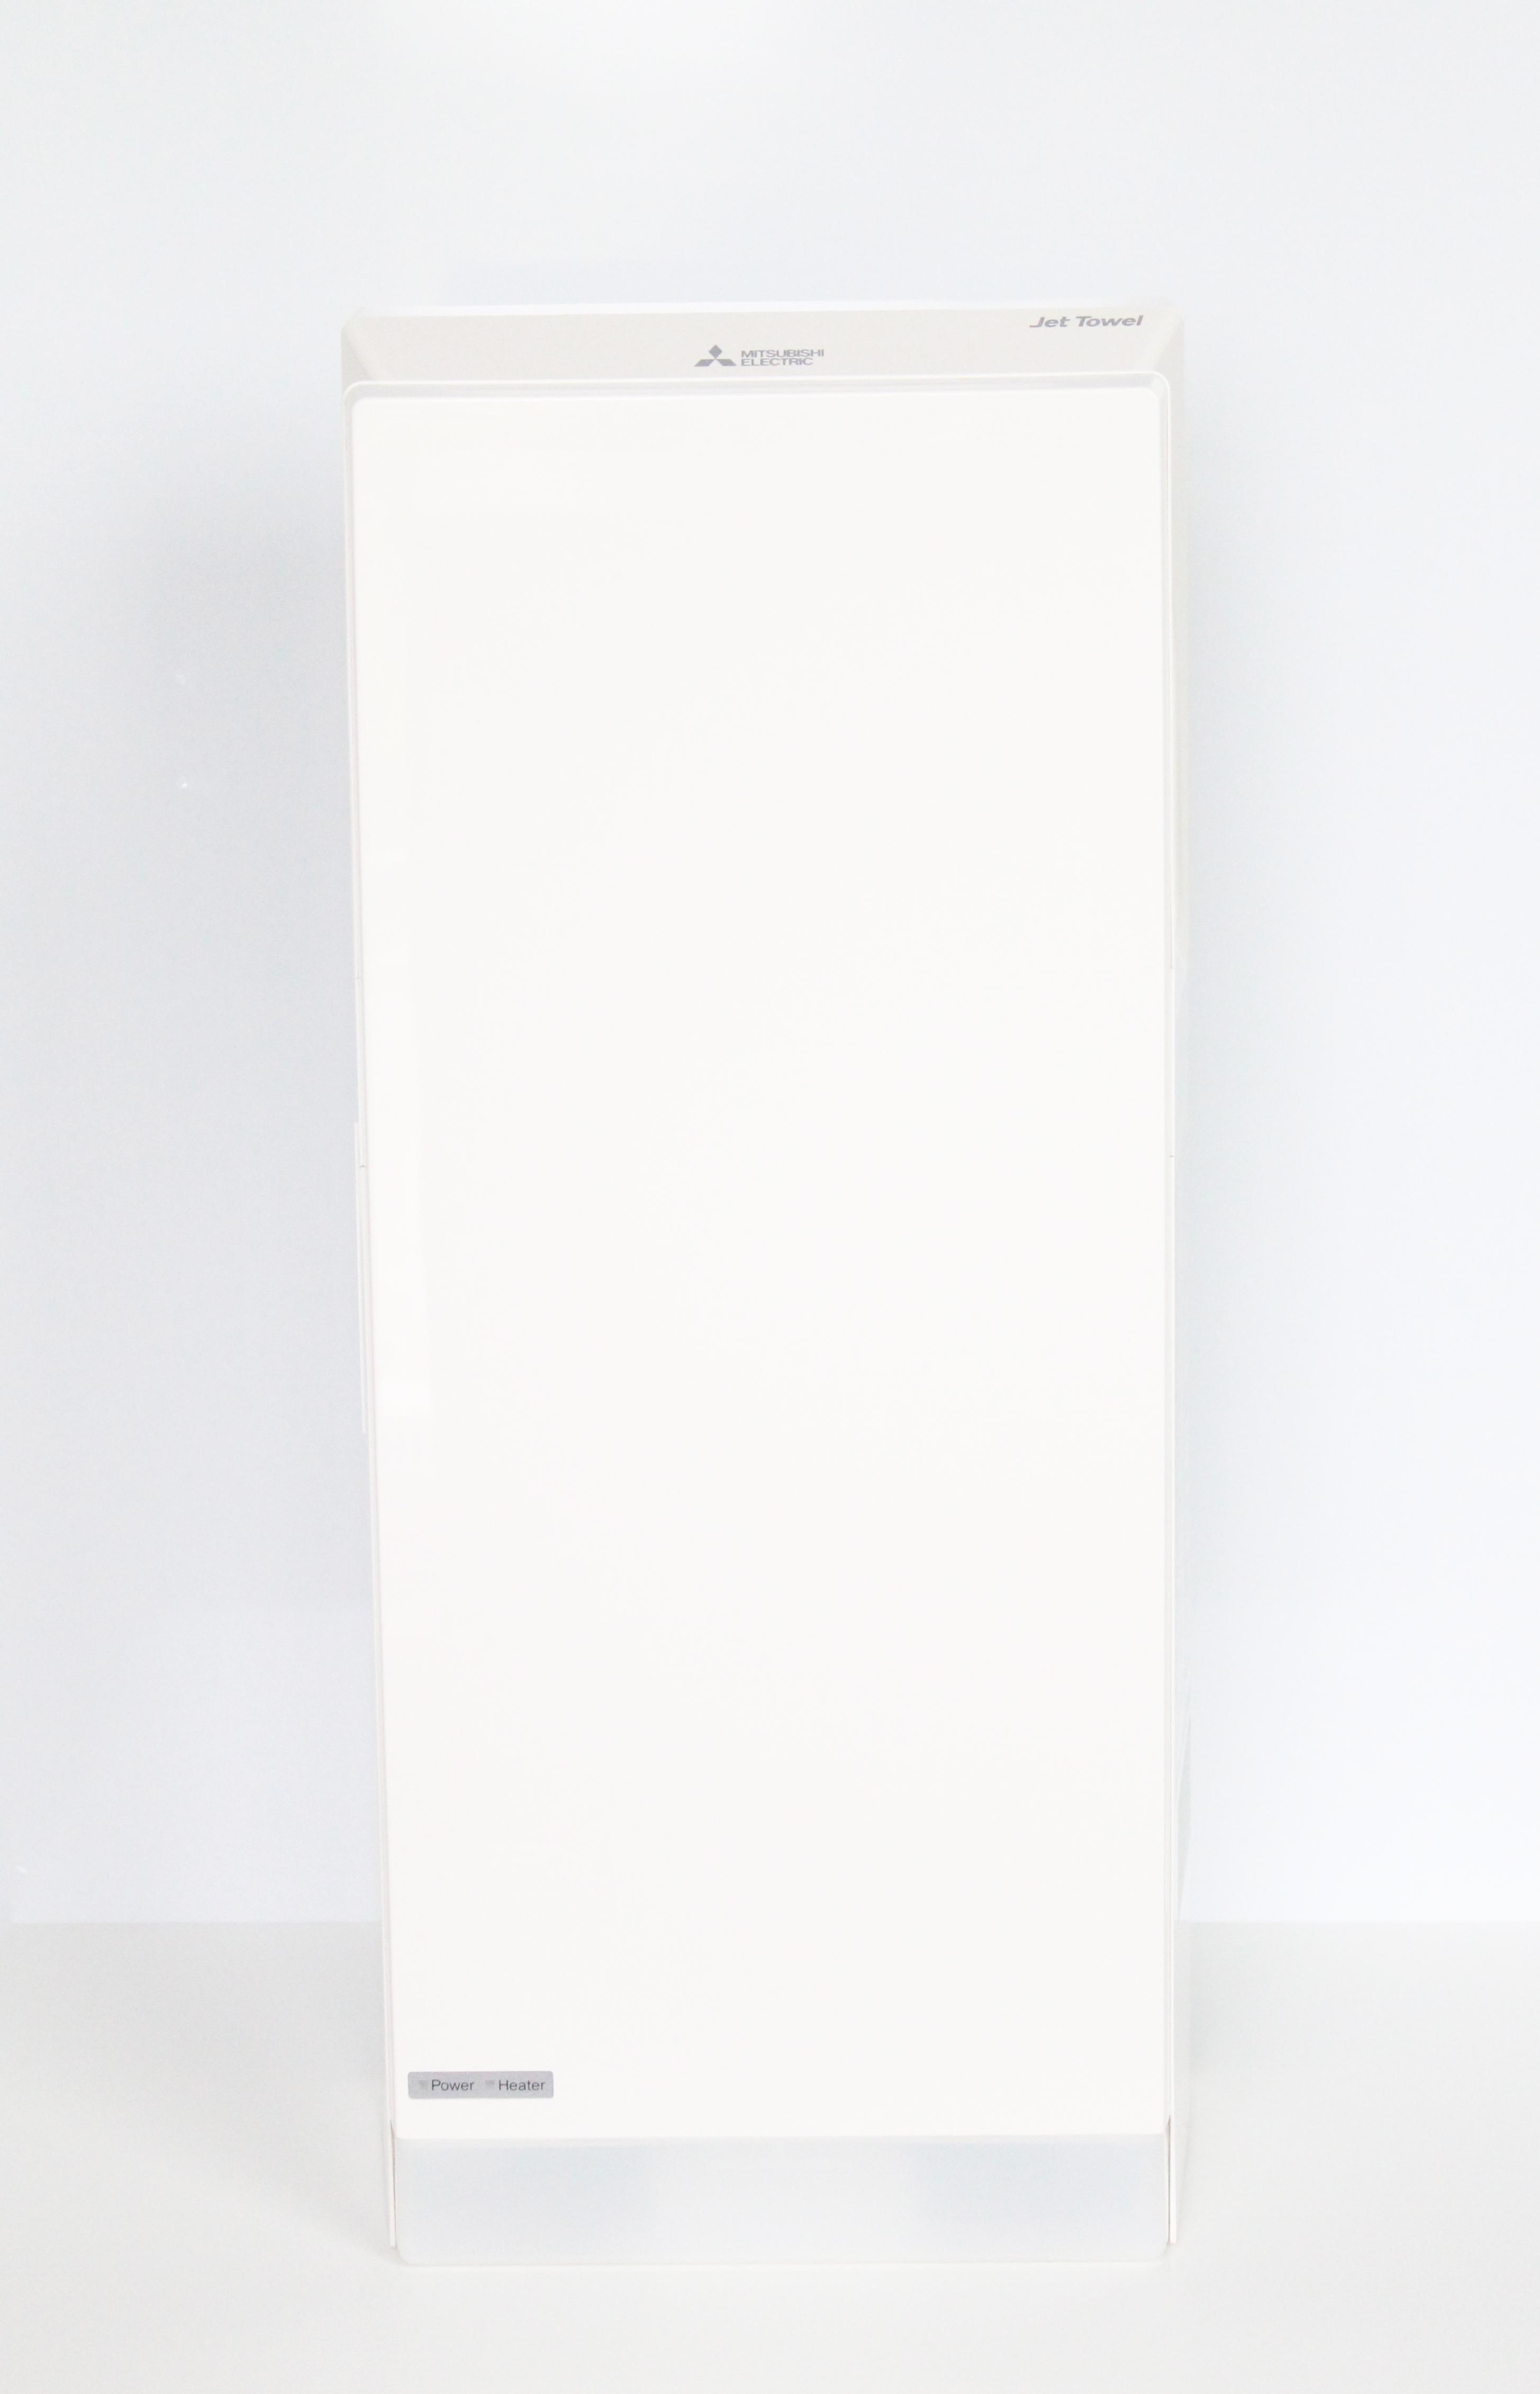 Mitsubishi Jet Towel Installation Manual